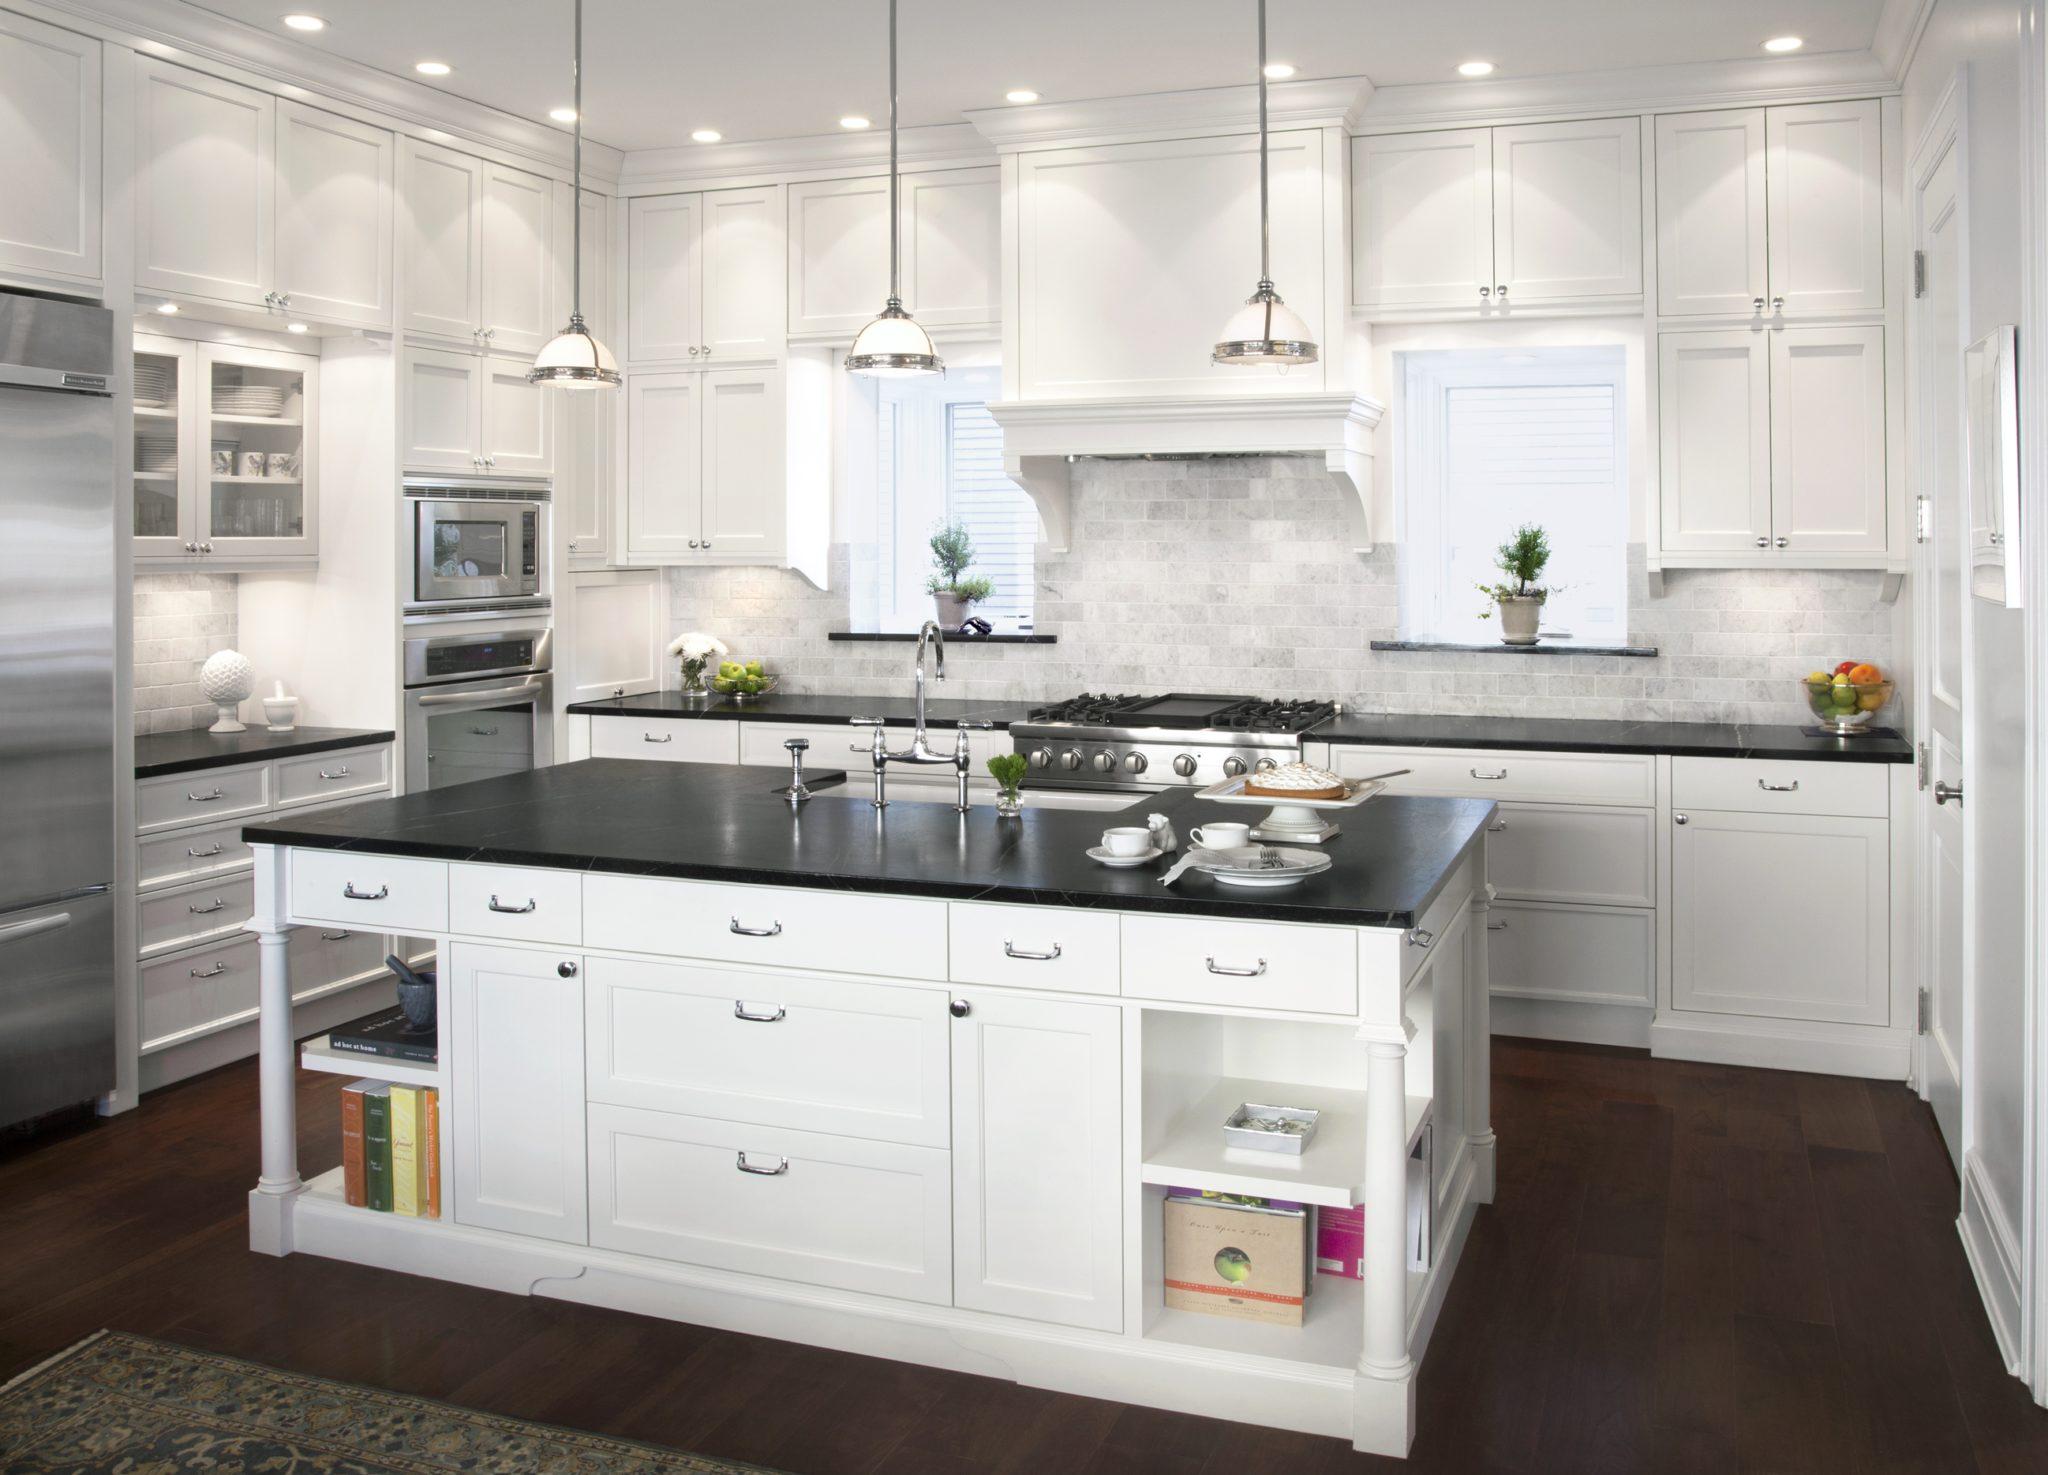 - 38 Kitchens With Marble Backsplashes - Chairish Blog